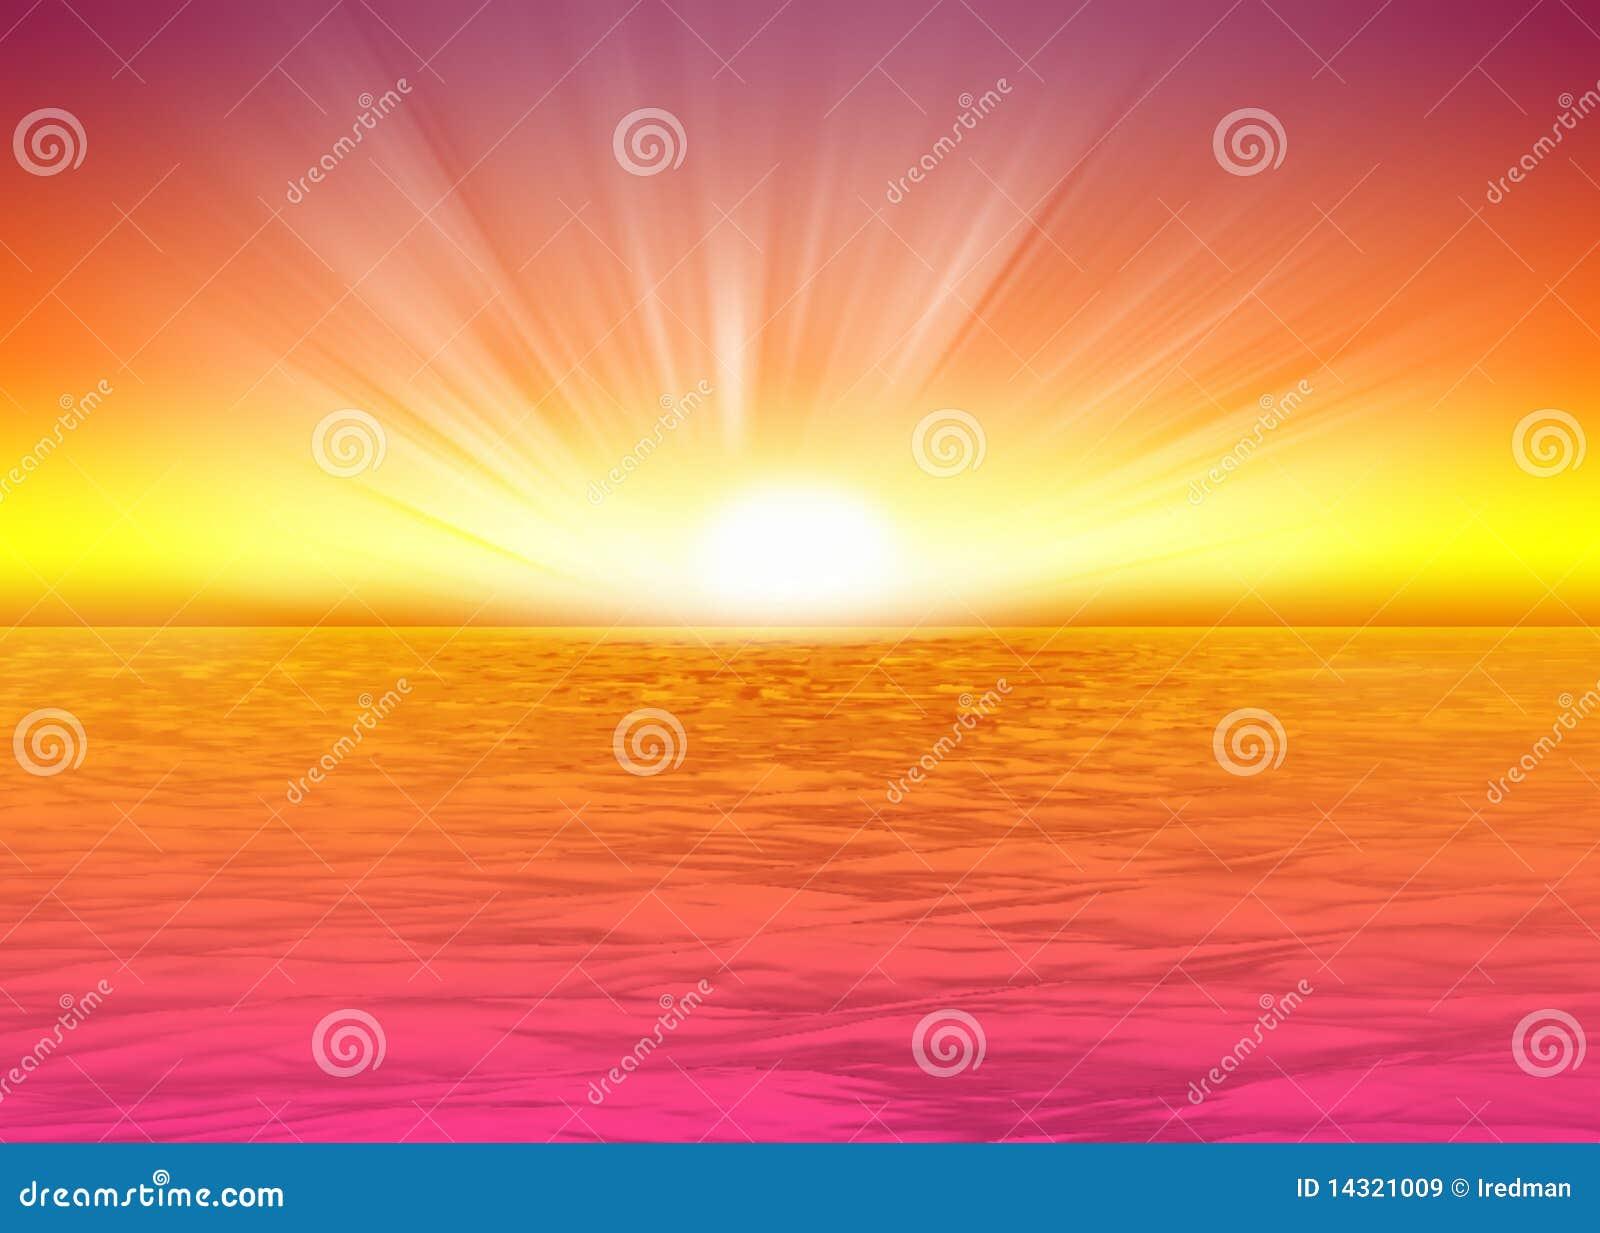 beautiful sea background rising sun royalty free stock